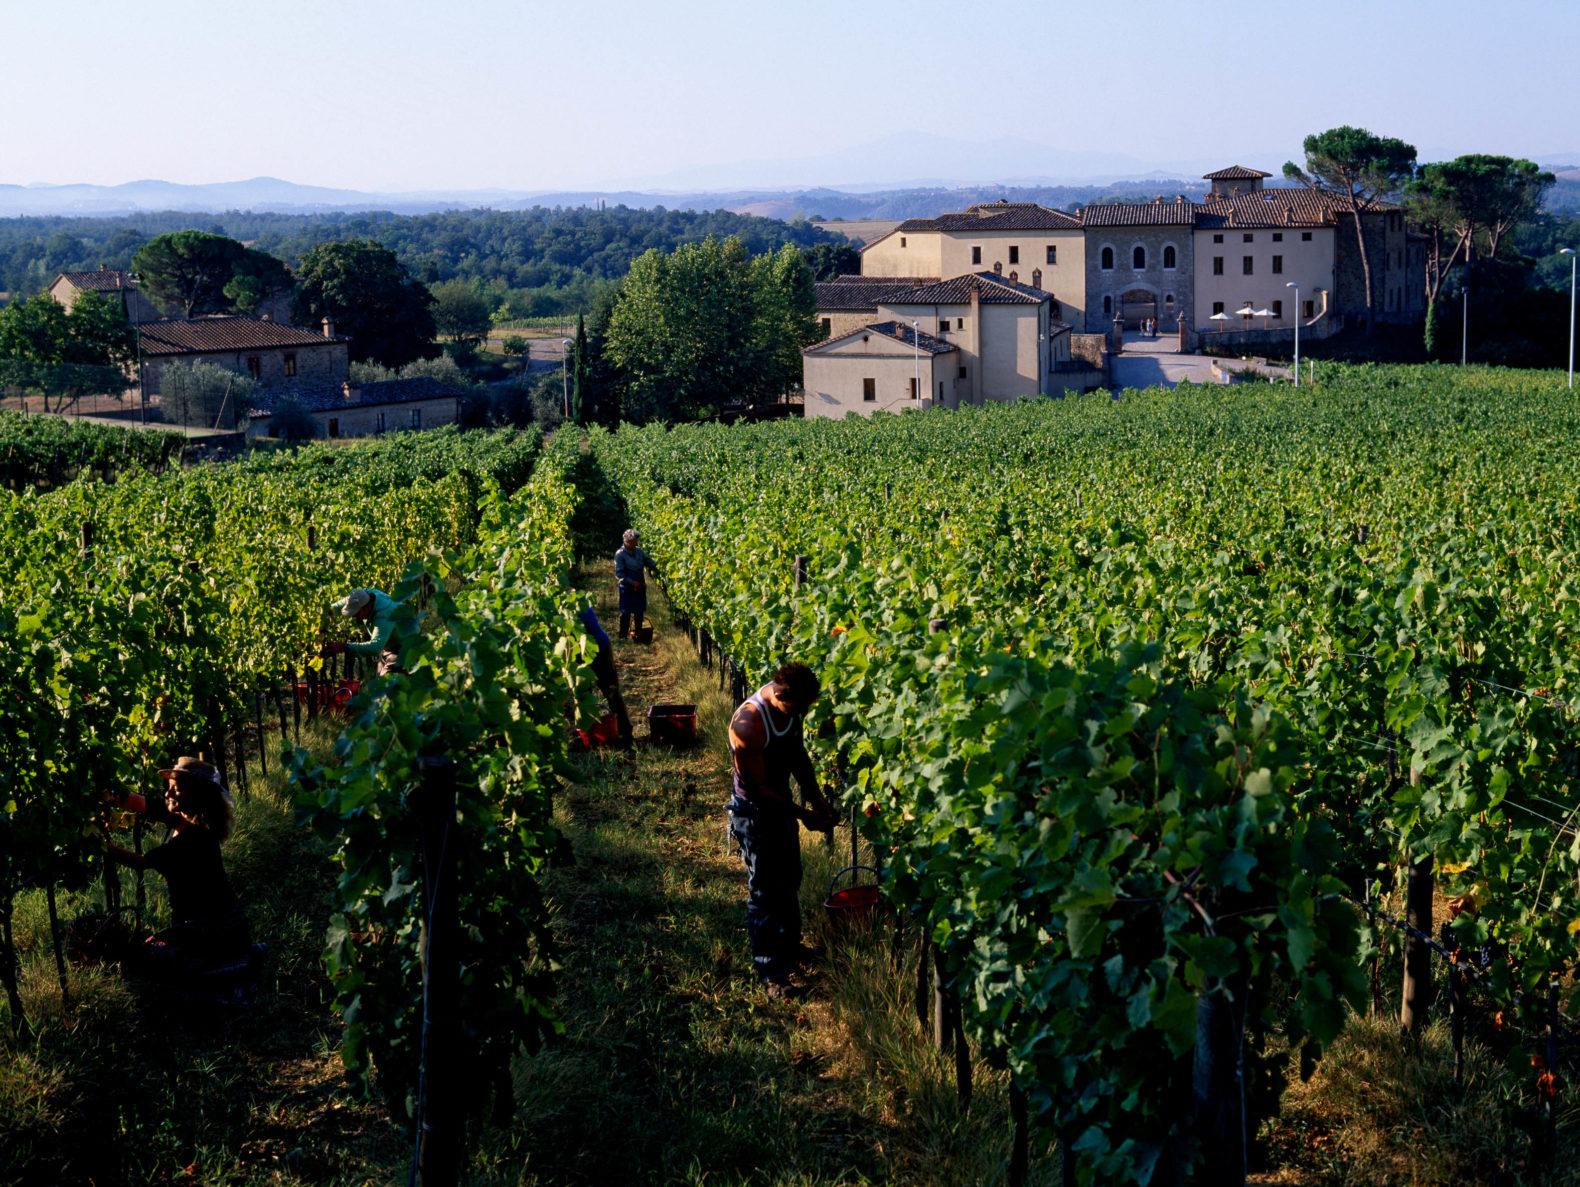 outdoor-nature-vineyard-castel-monastero-spa-retreat-italy